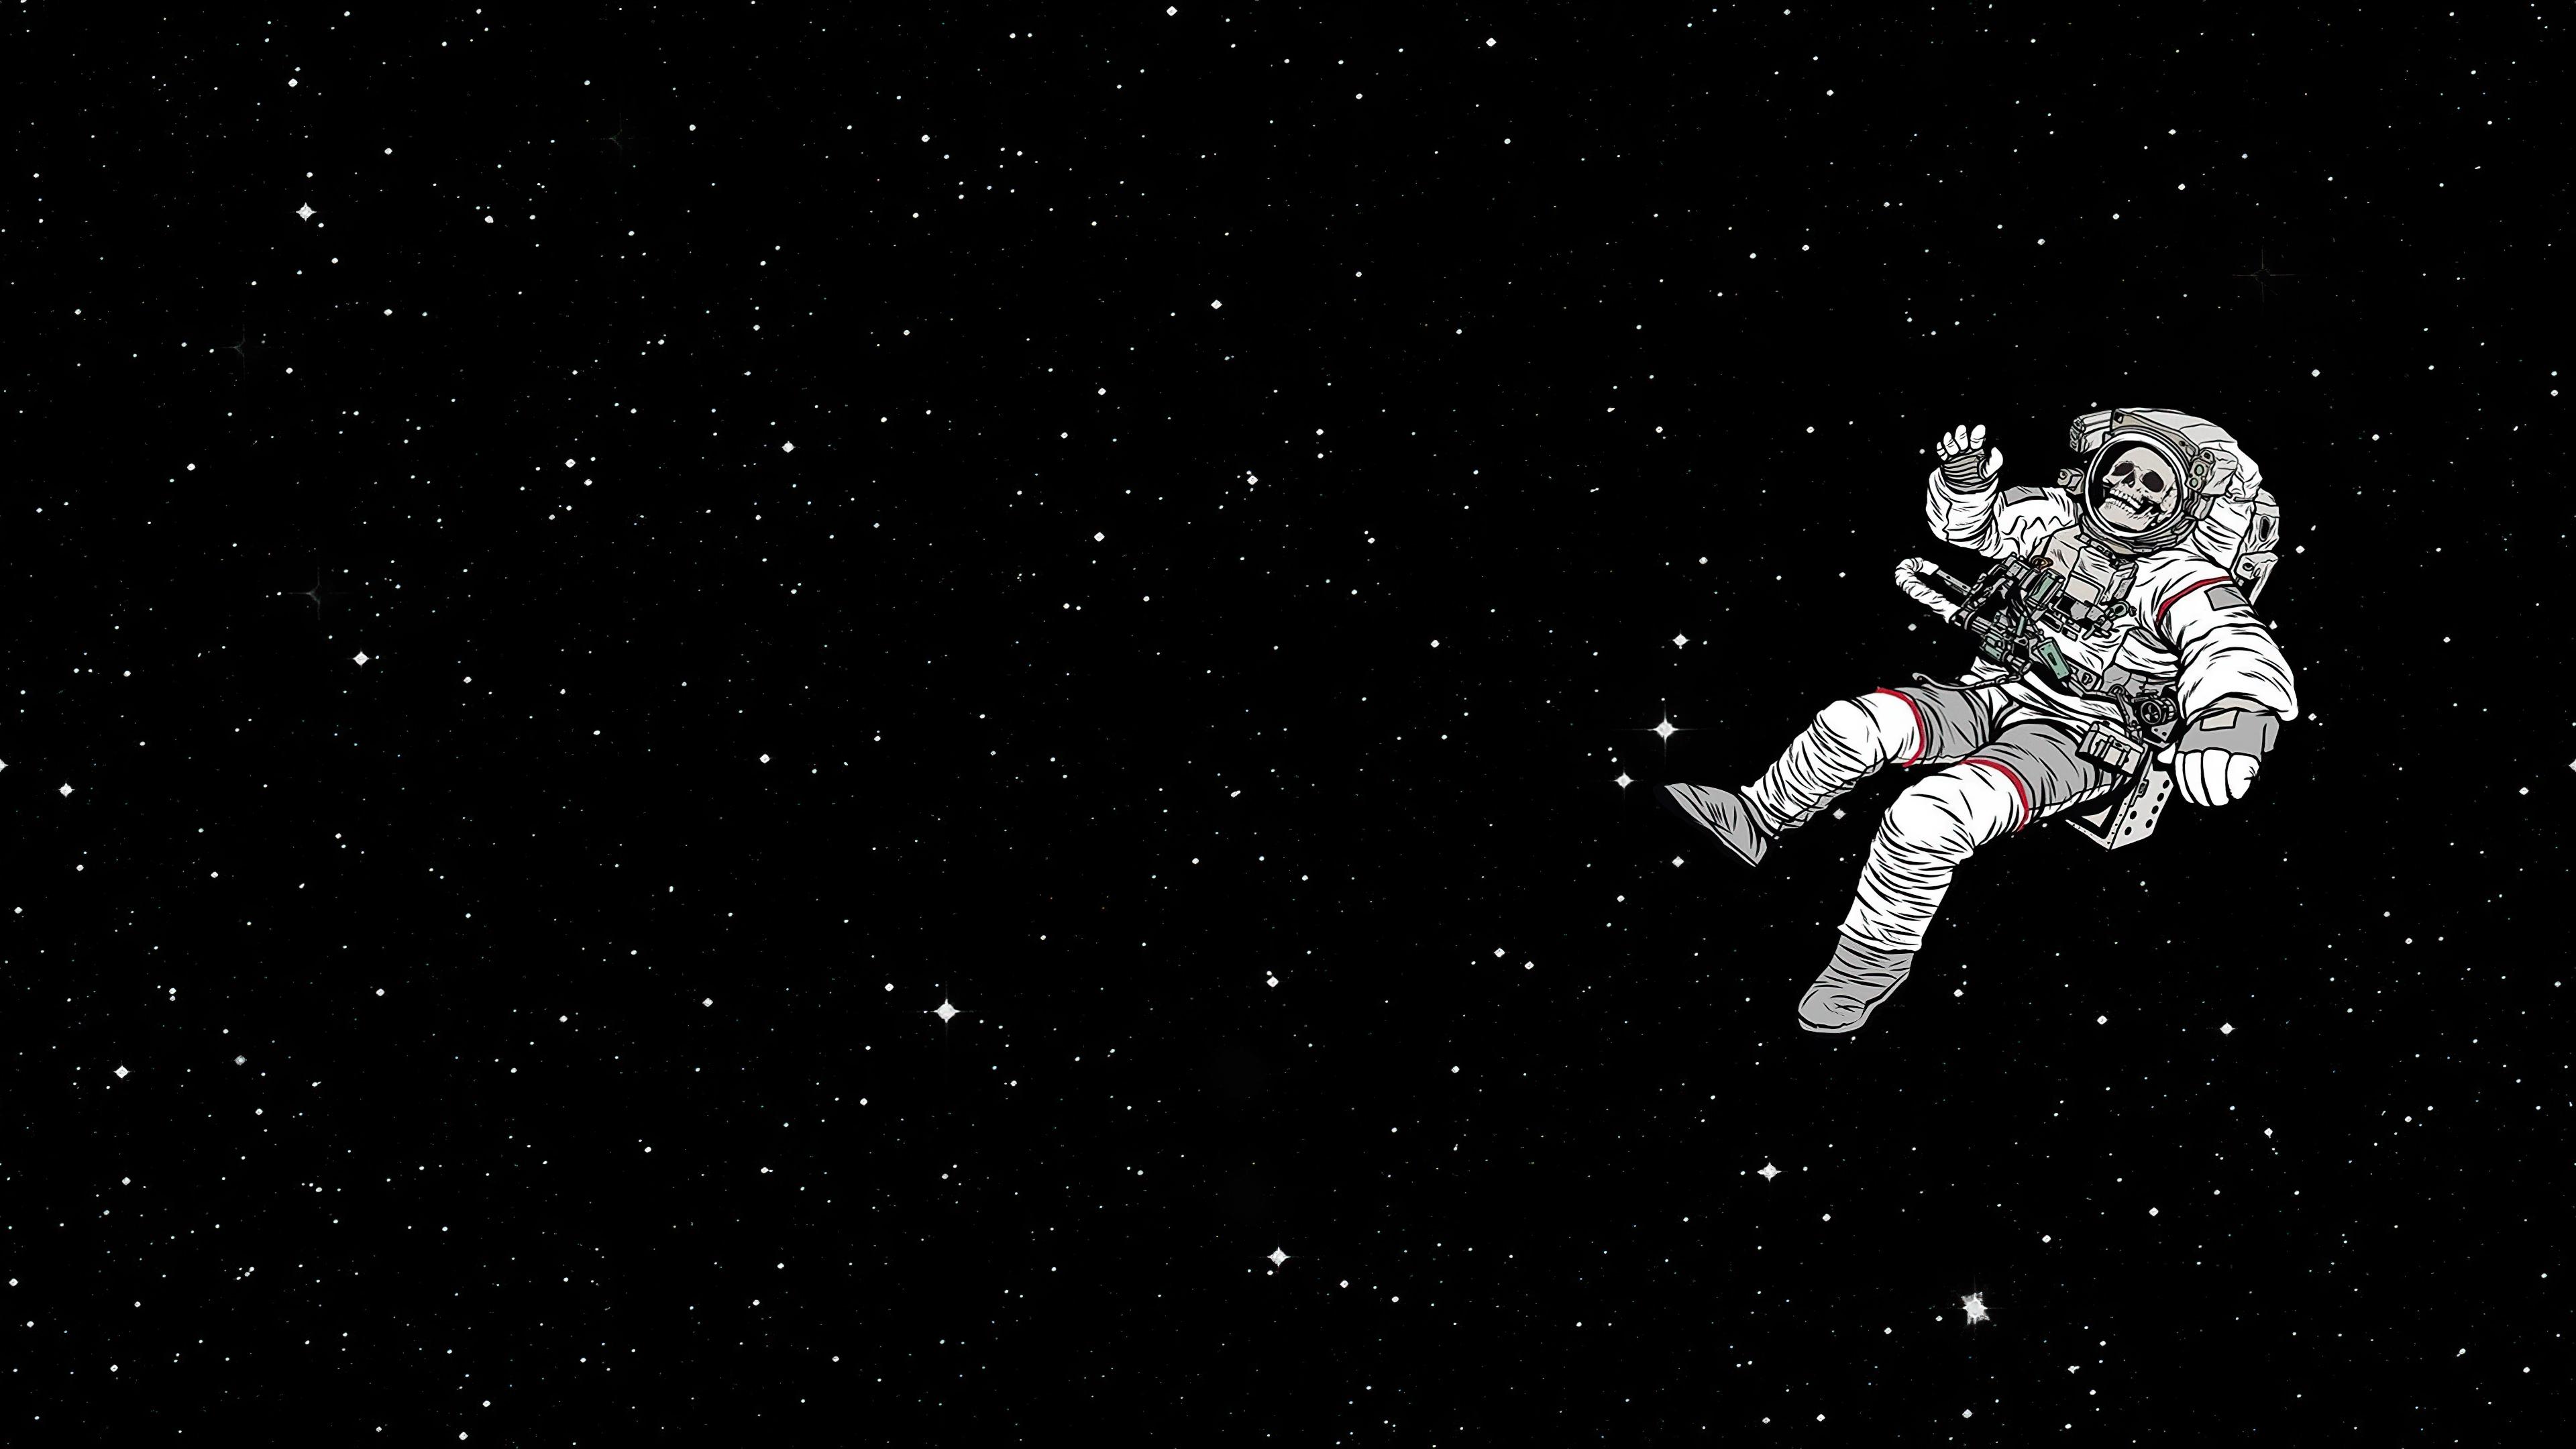 Astronaut 4k Ultra Hd Wallpaper Background Image 3840x2160 Id 1080217 Wallpaper Abyss